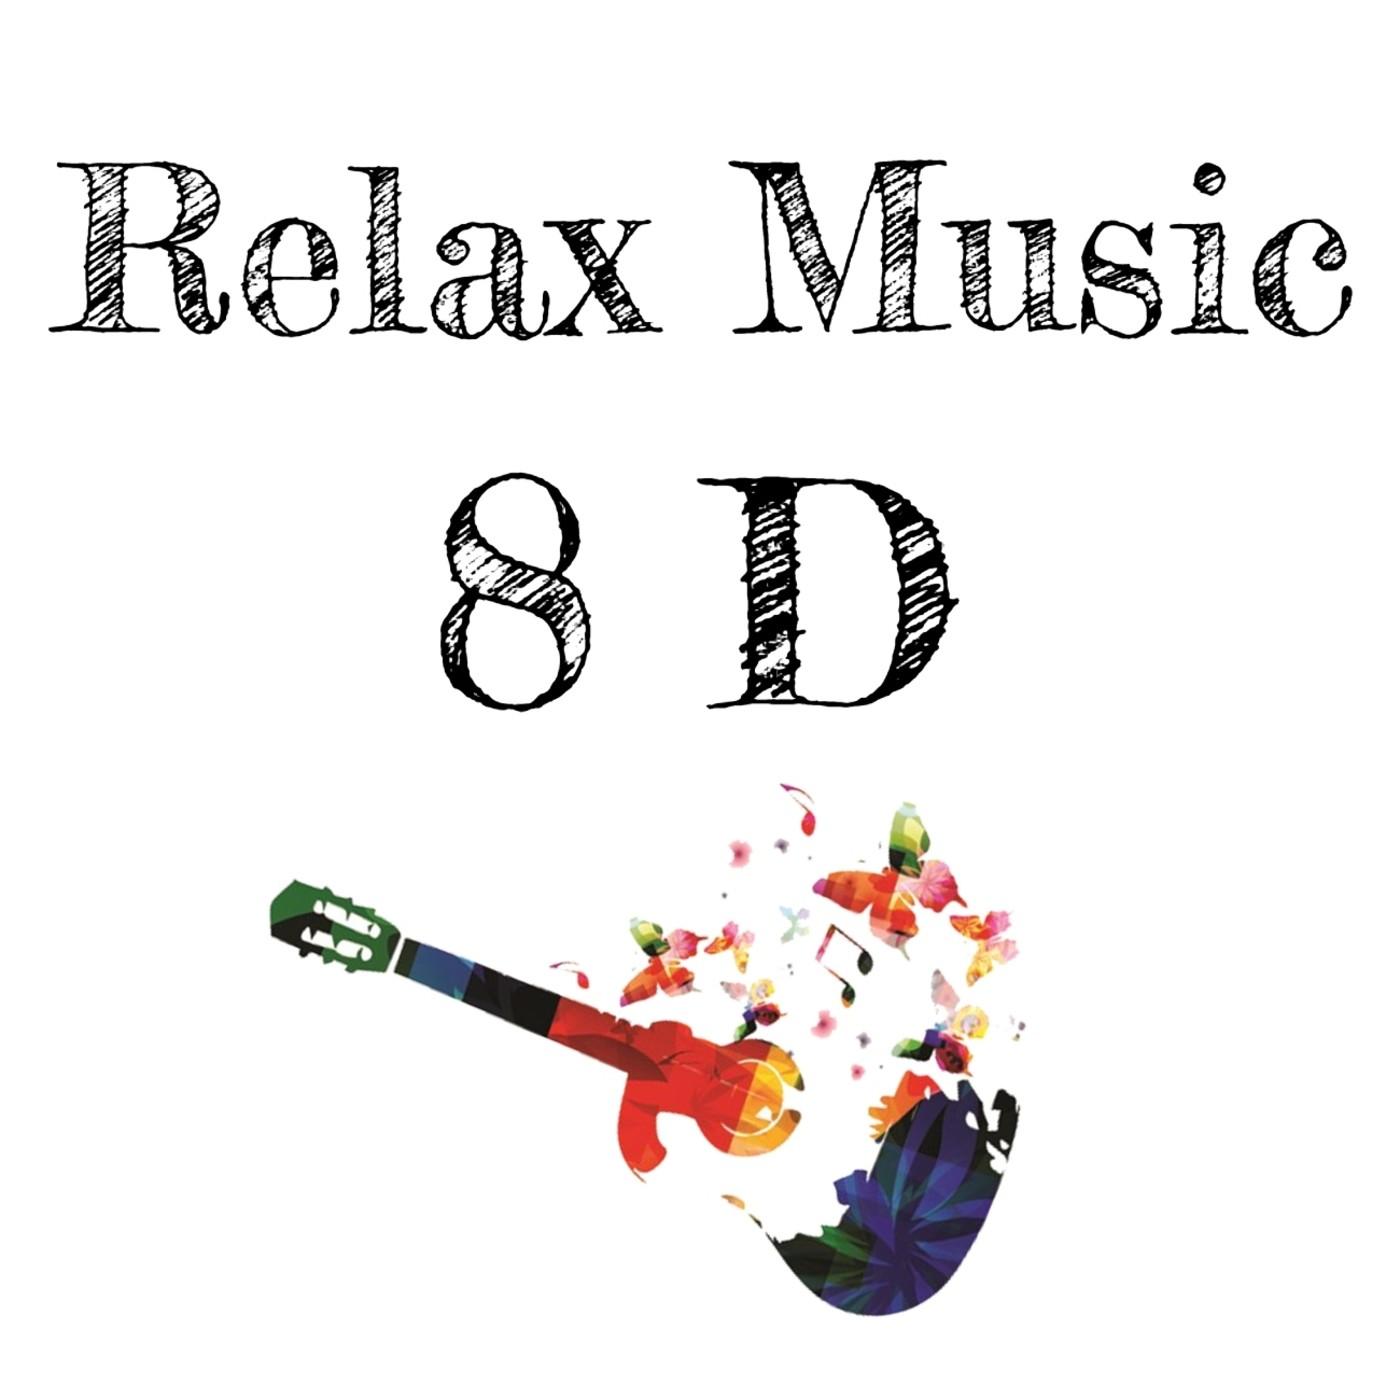 Yiruma 8D - Musica de piano relajante 8D - Piano 8D